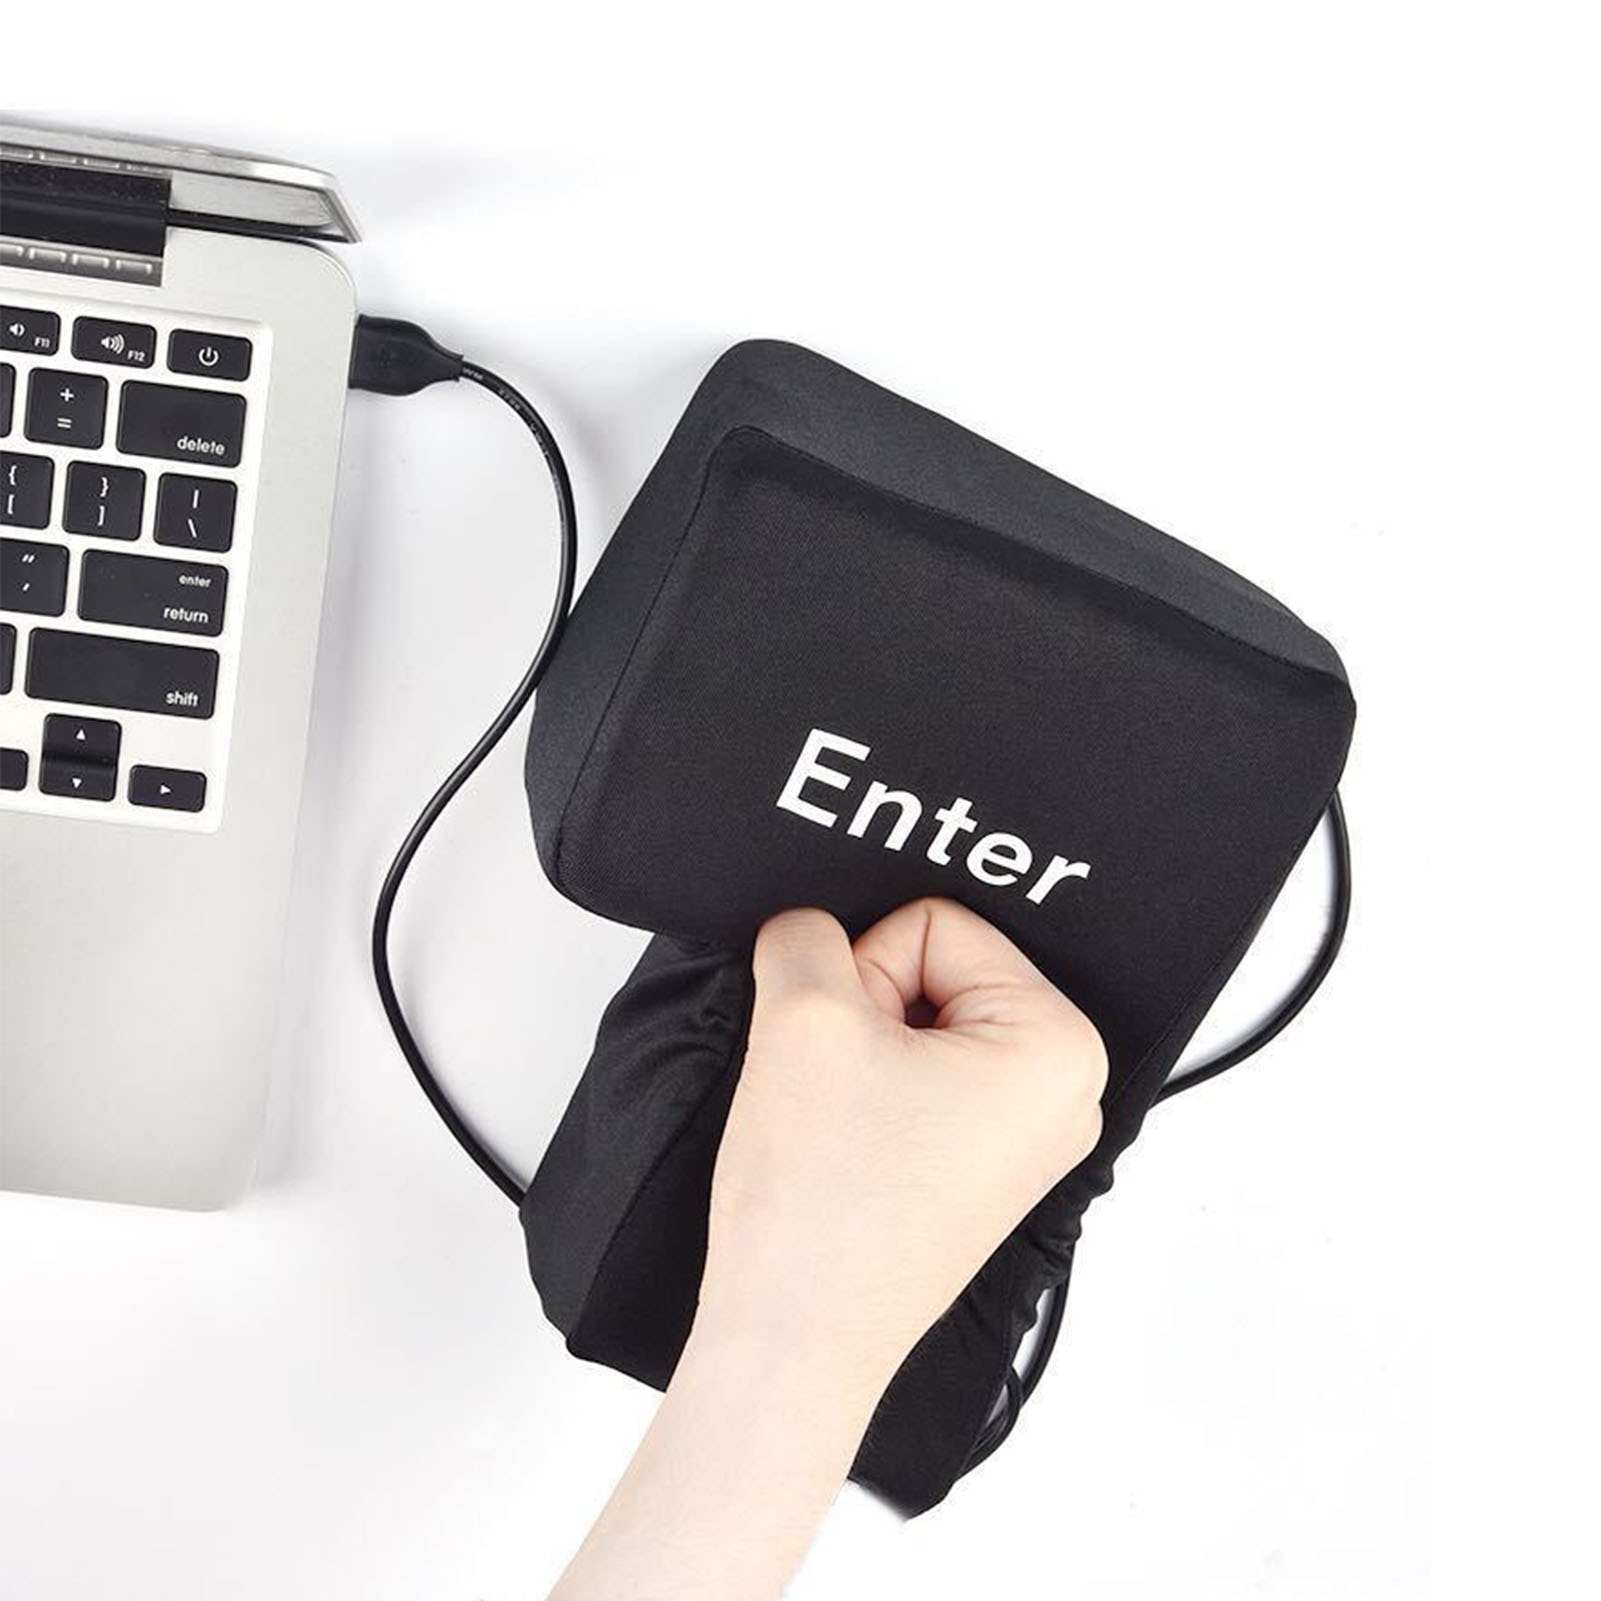 Hot USB Enter Key Vent Pillow Soft Computer Button Return Key Offices Decompression Pillow Stress Relief Toy Wholesale enlarge